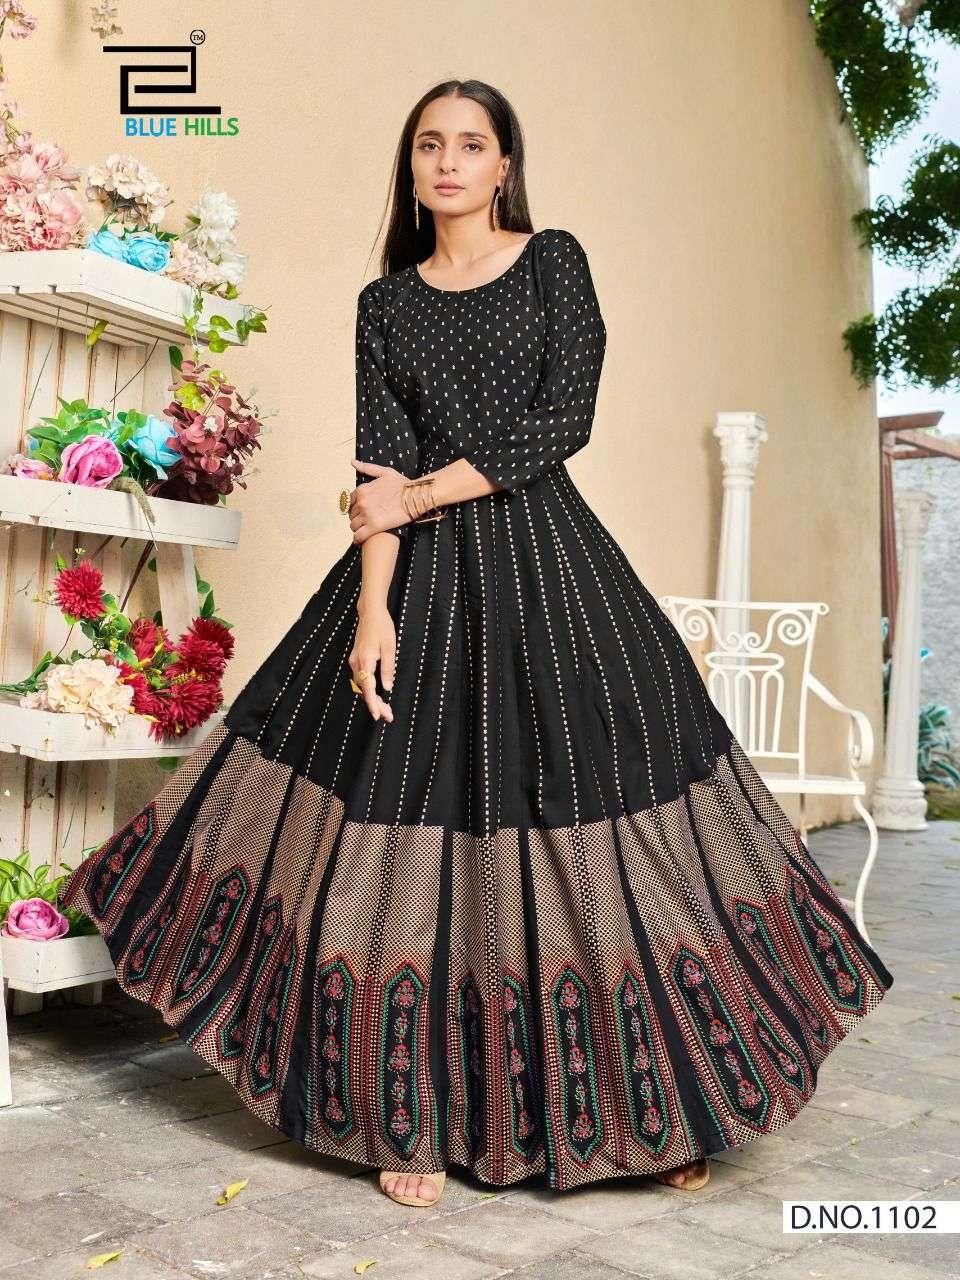 Blue Hills Poshak Vol 1 Long kali Style Rayon Kurti Gown Catalog Wholesale Price